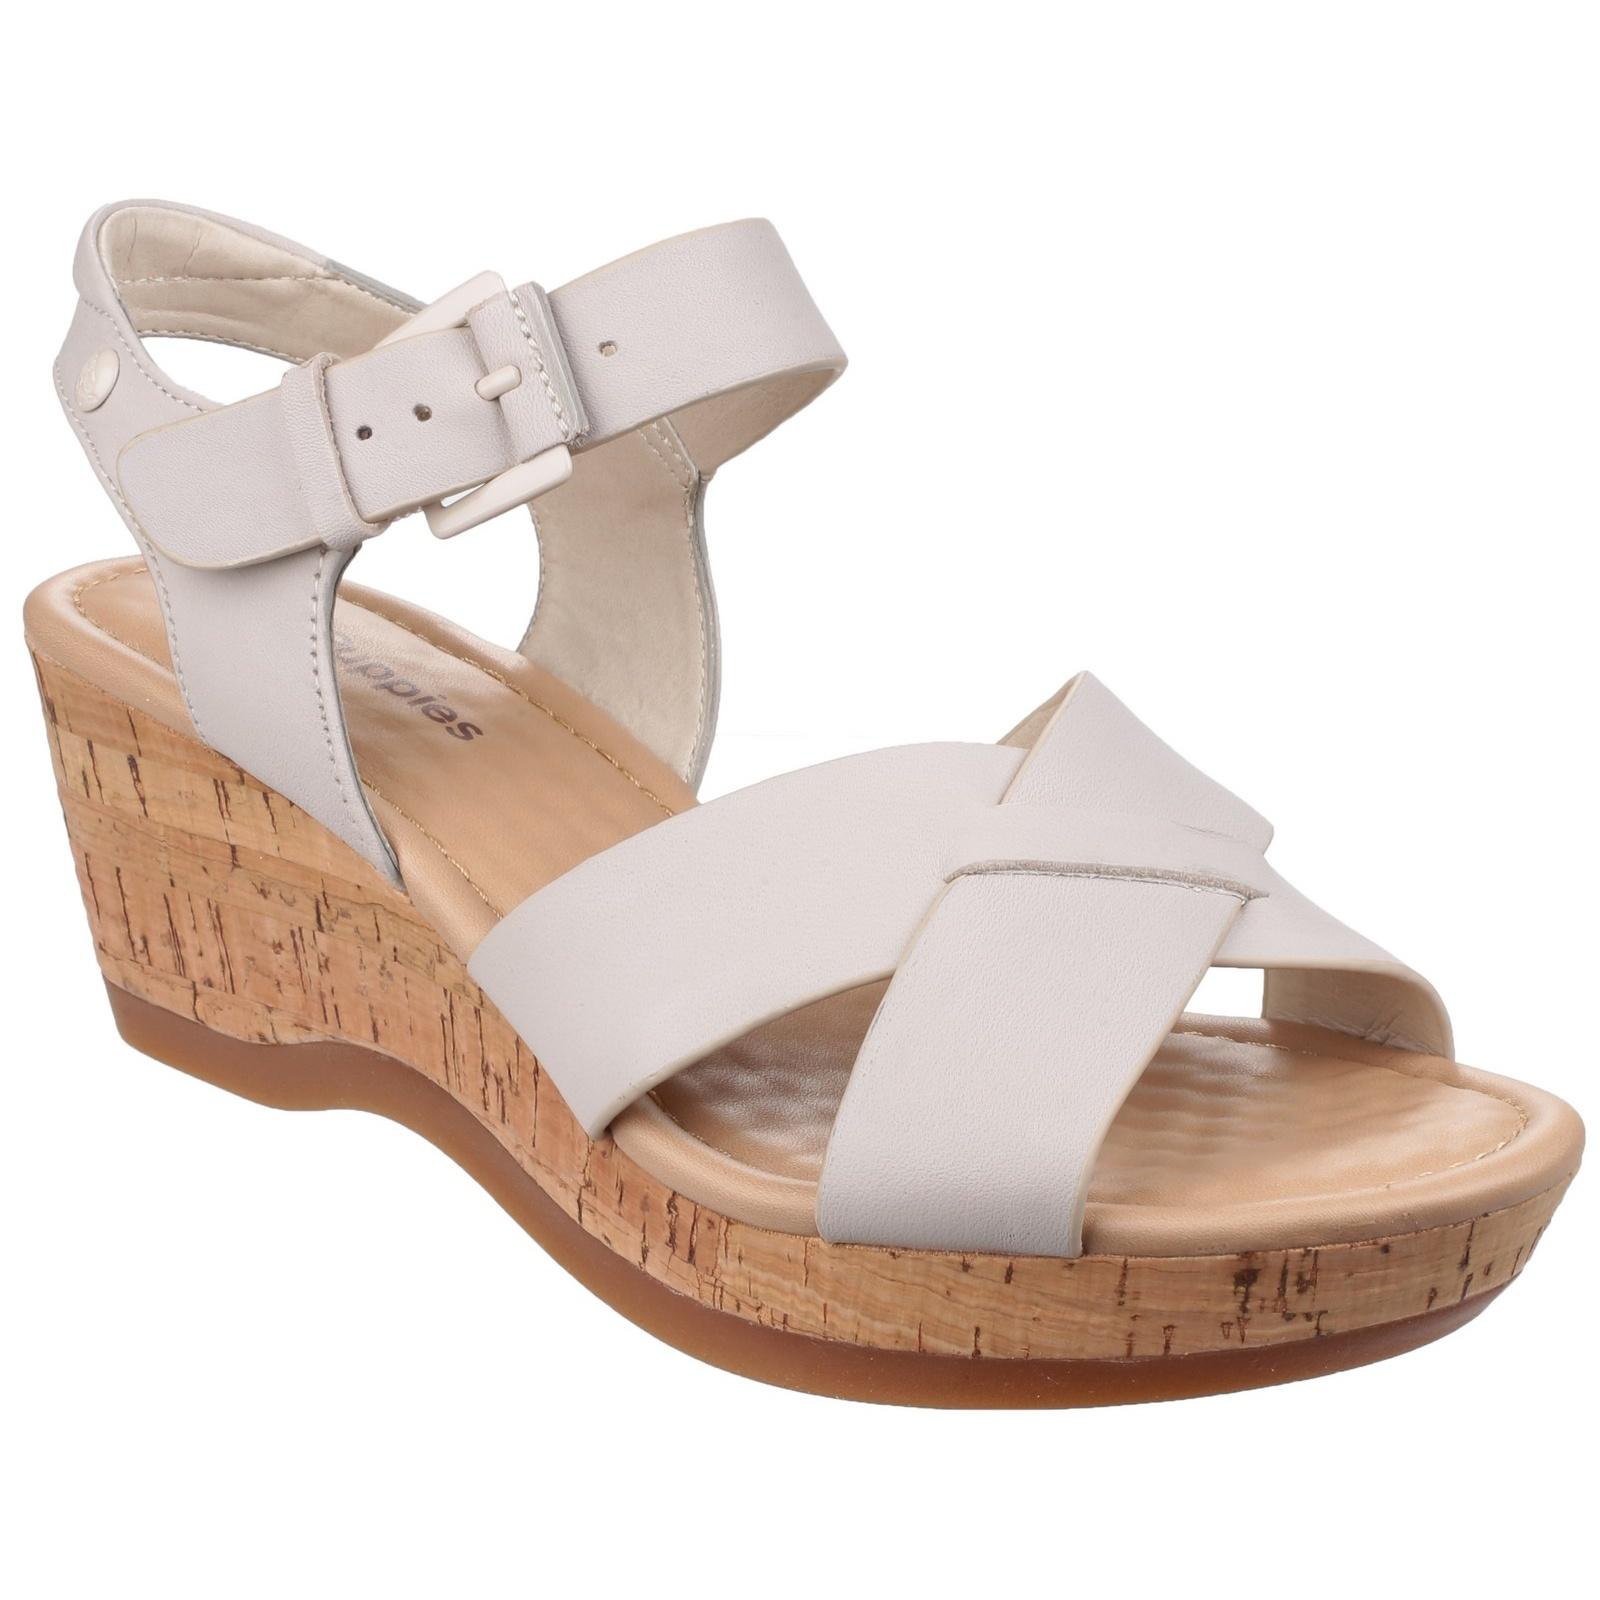 Womens sandals ebay - Hush Puppies Womens Ladies Eva Farris Cross Strap